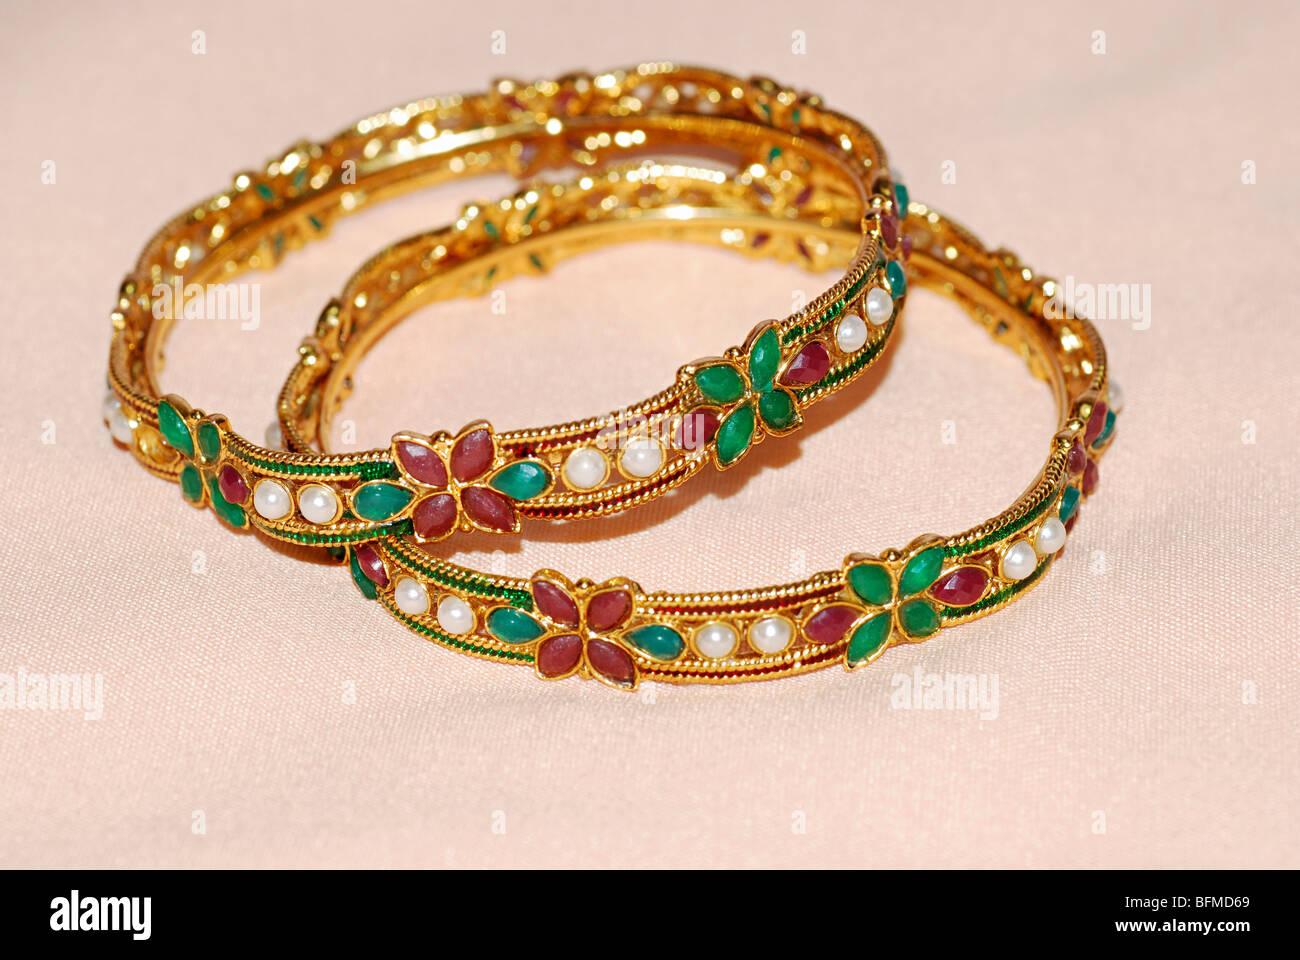 Jewelry. Stone studded Bangle set. - Stock Image